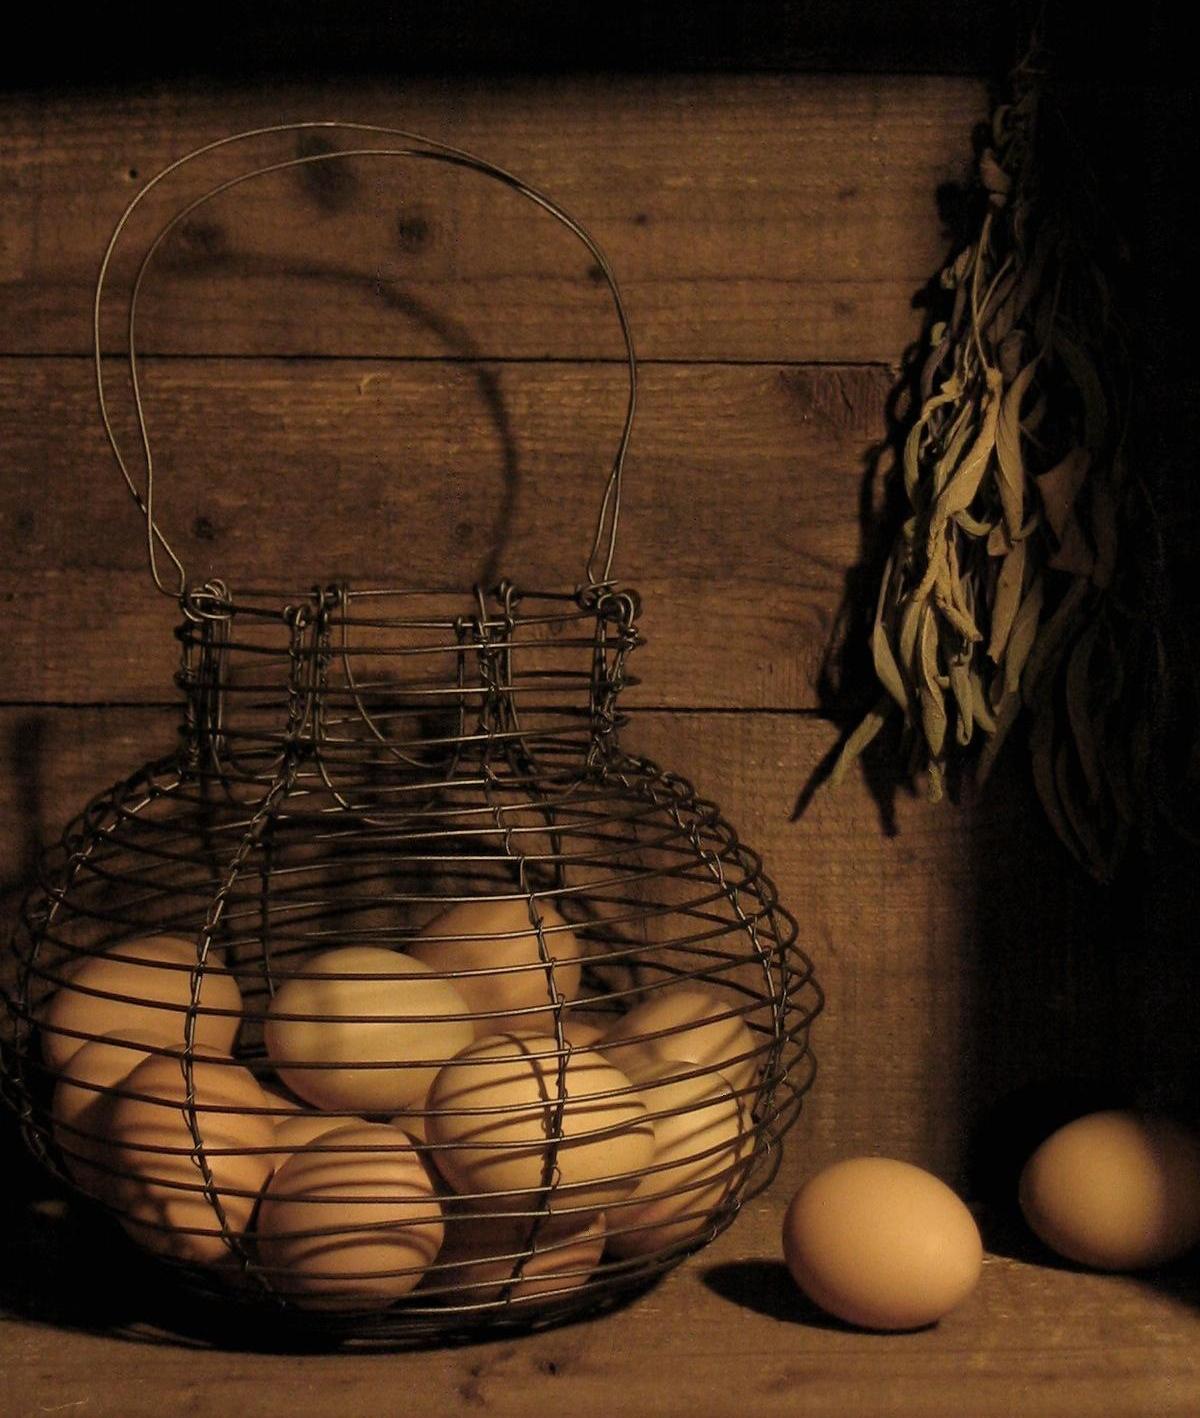 Daryl McMahon: Wire Egg basket